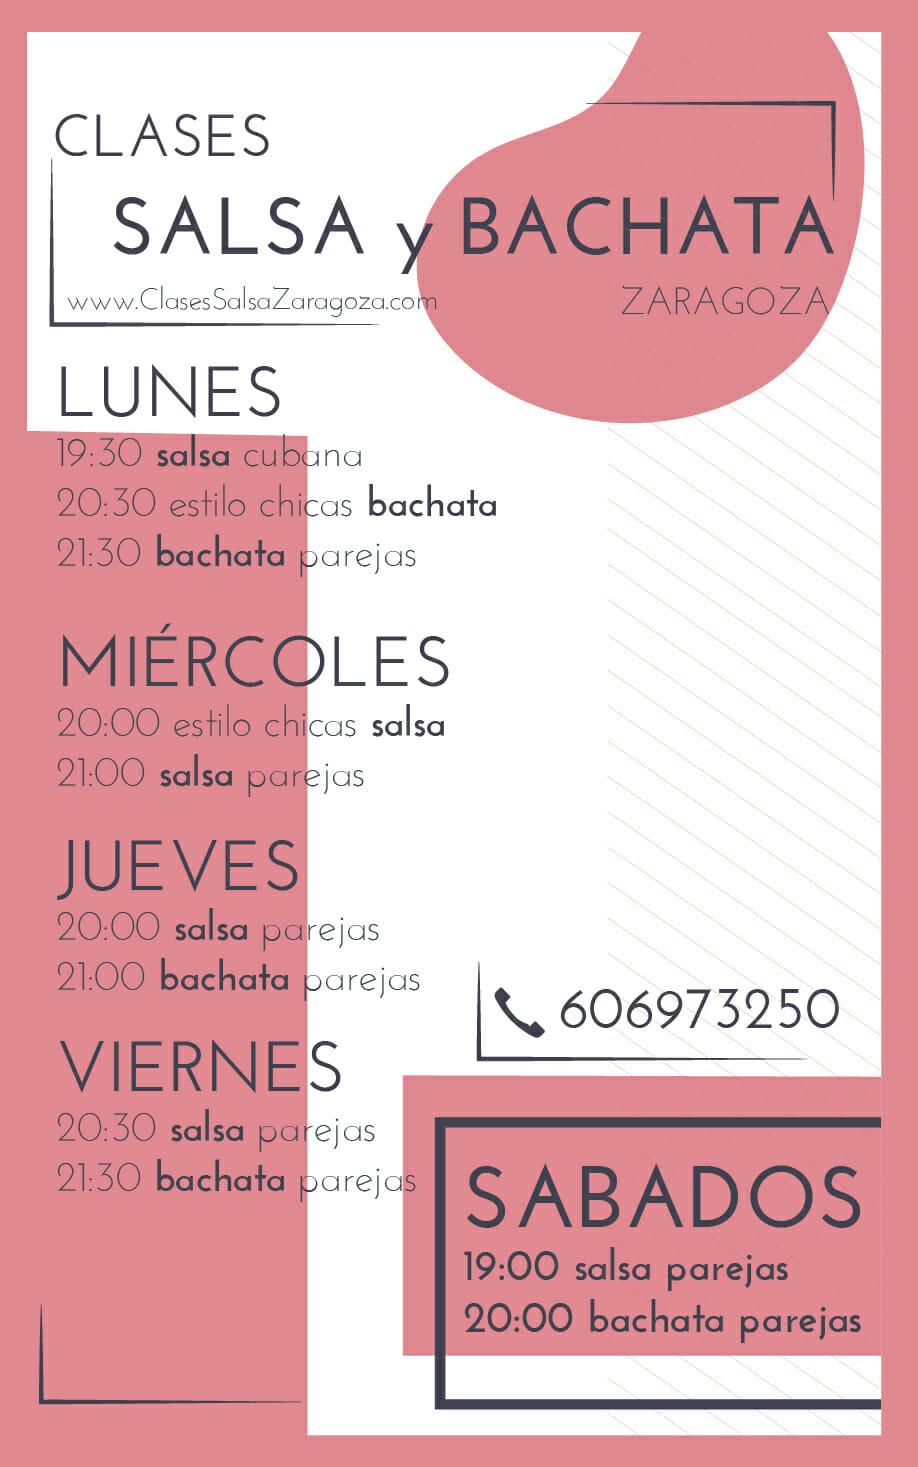 Horarios clases de Salsa y Bachata en Zaragoza